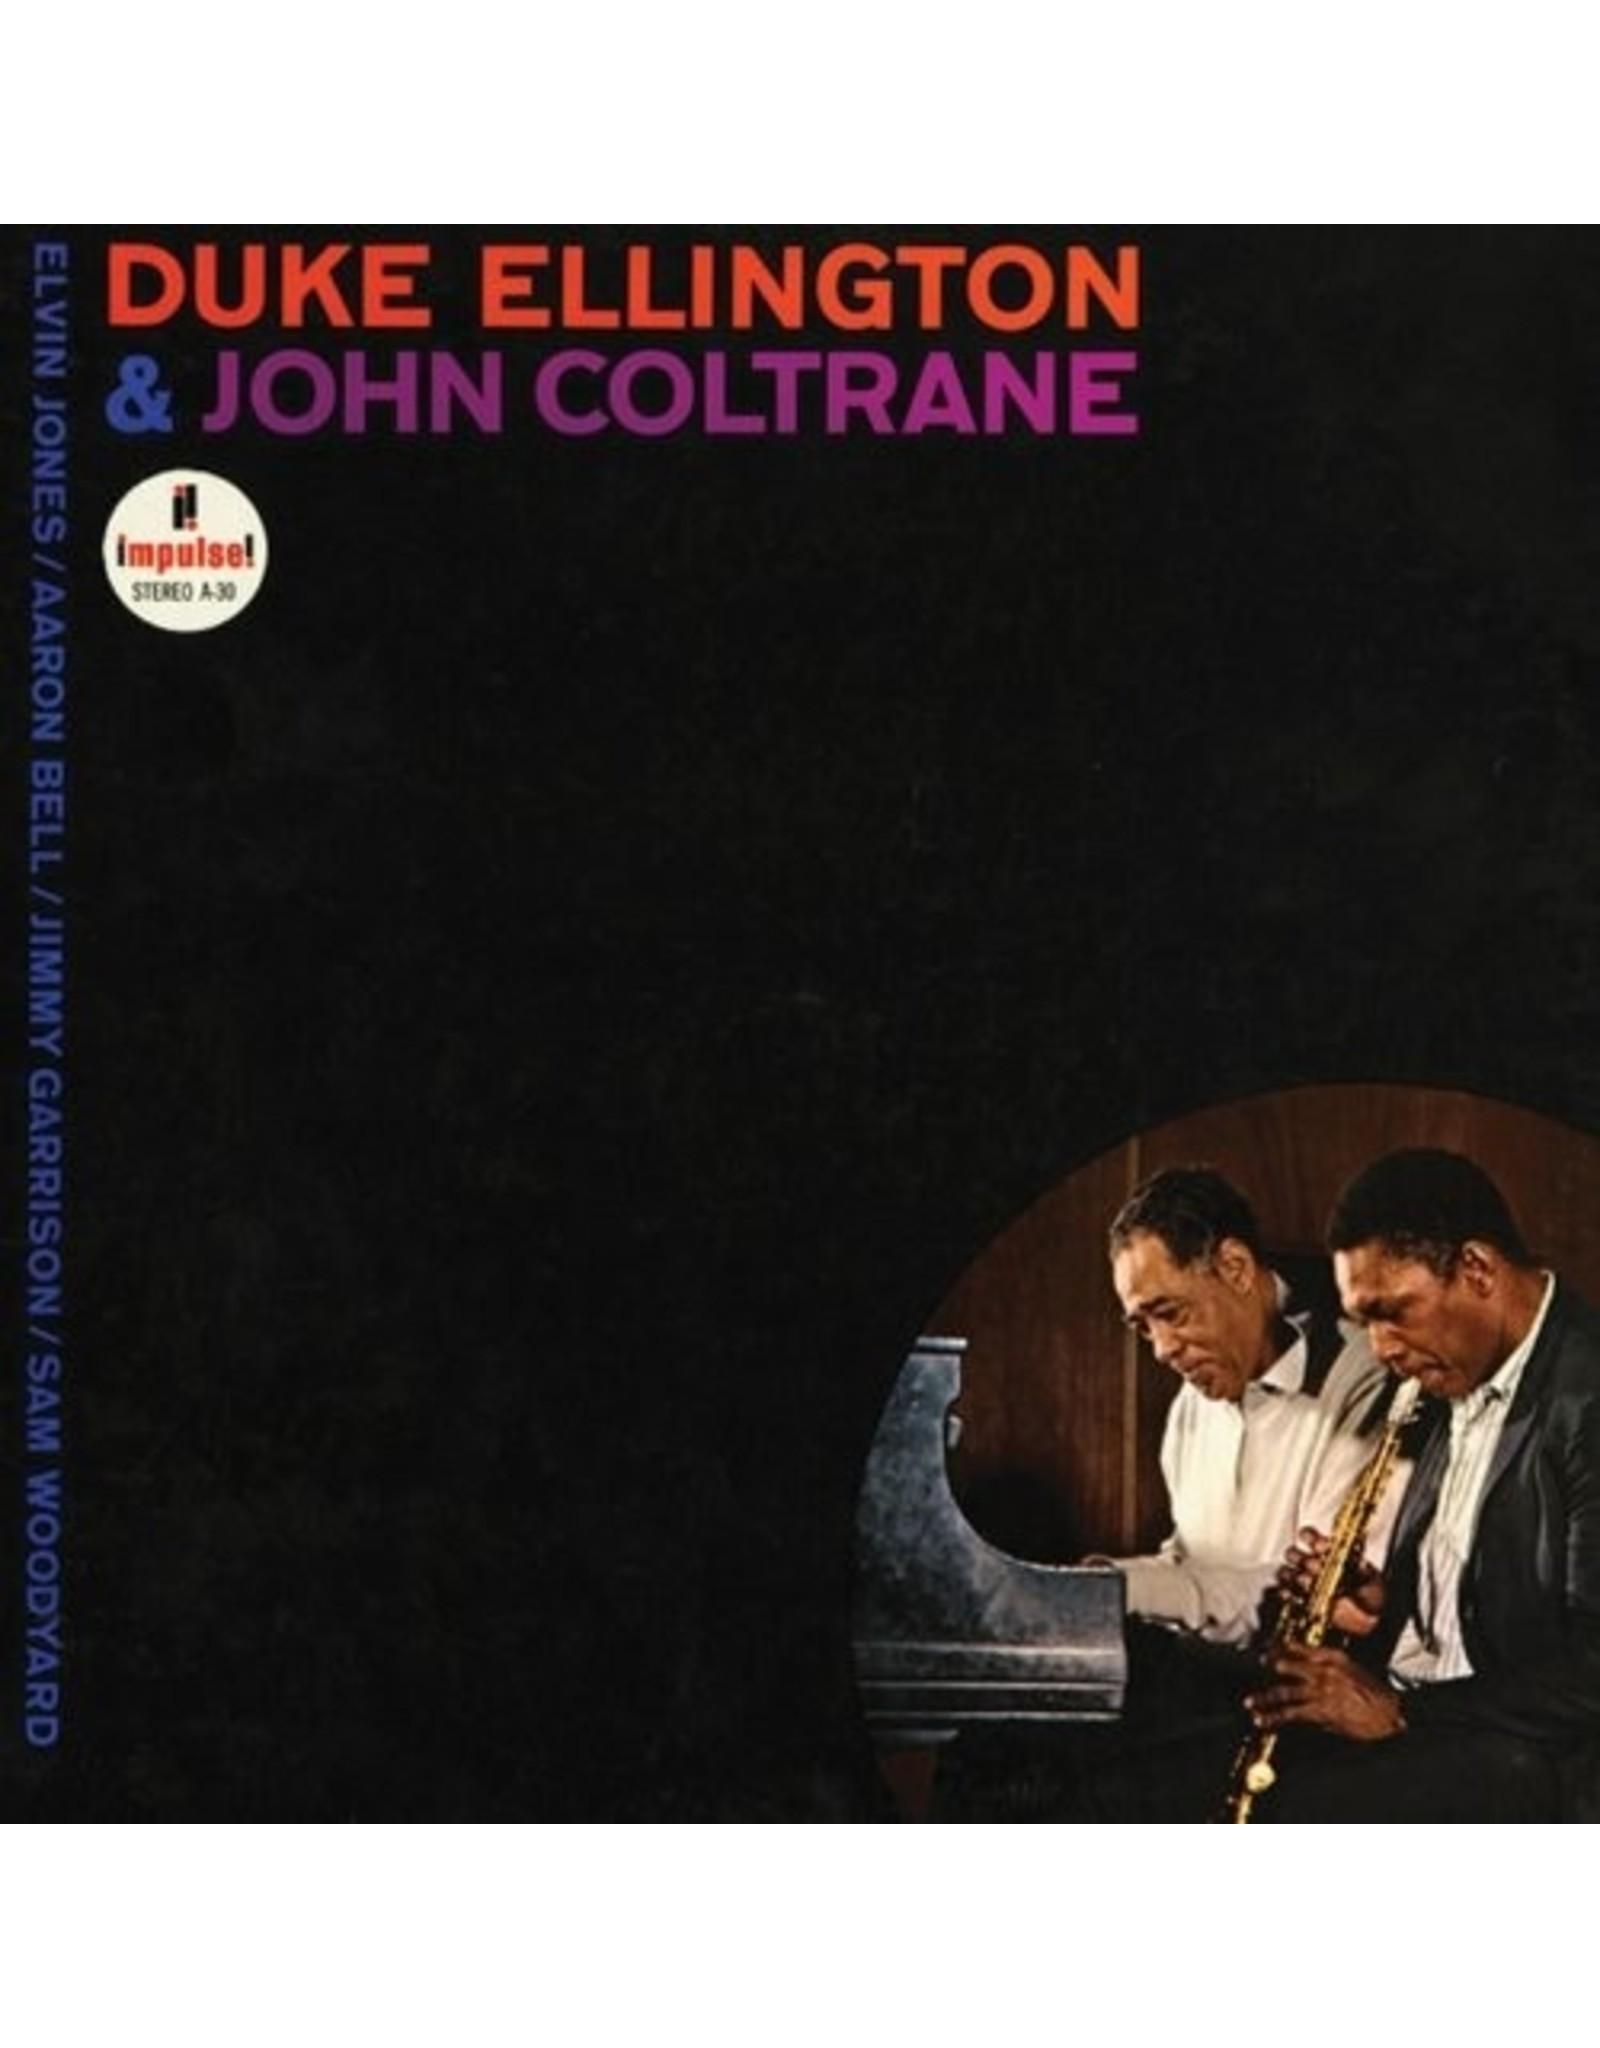 New Vinyl Duke Ellington & John Coltrane - S/T LP